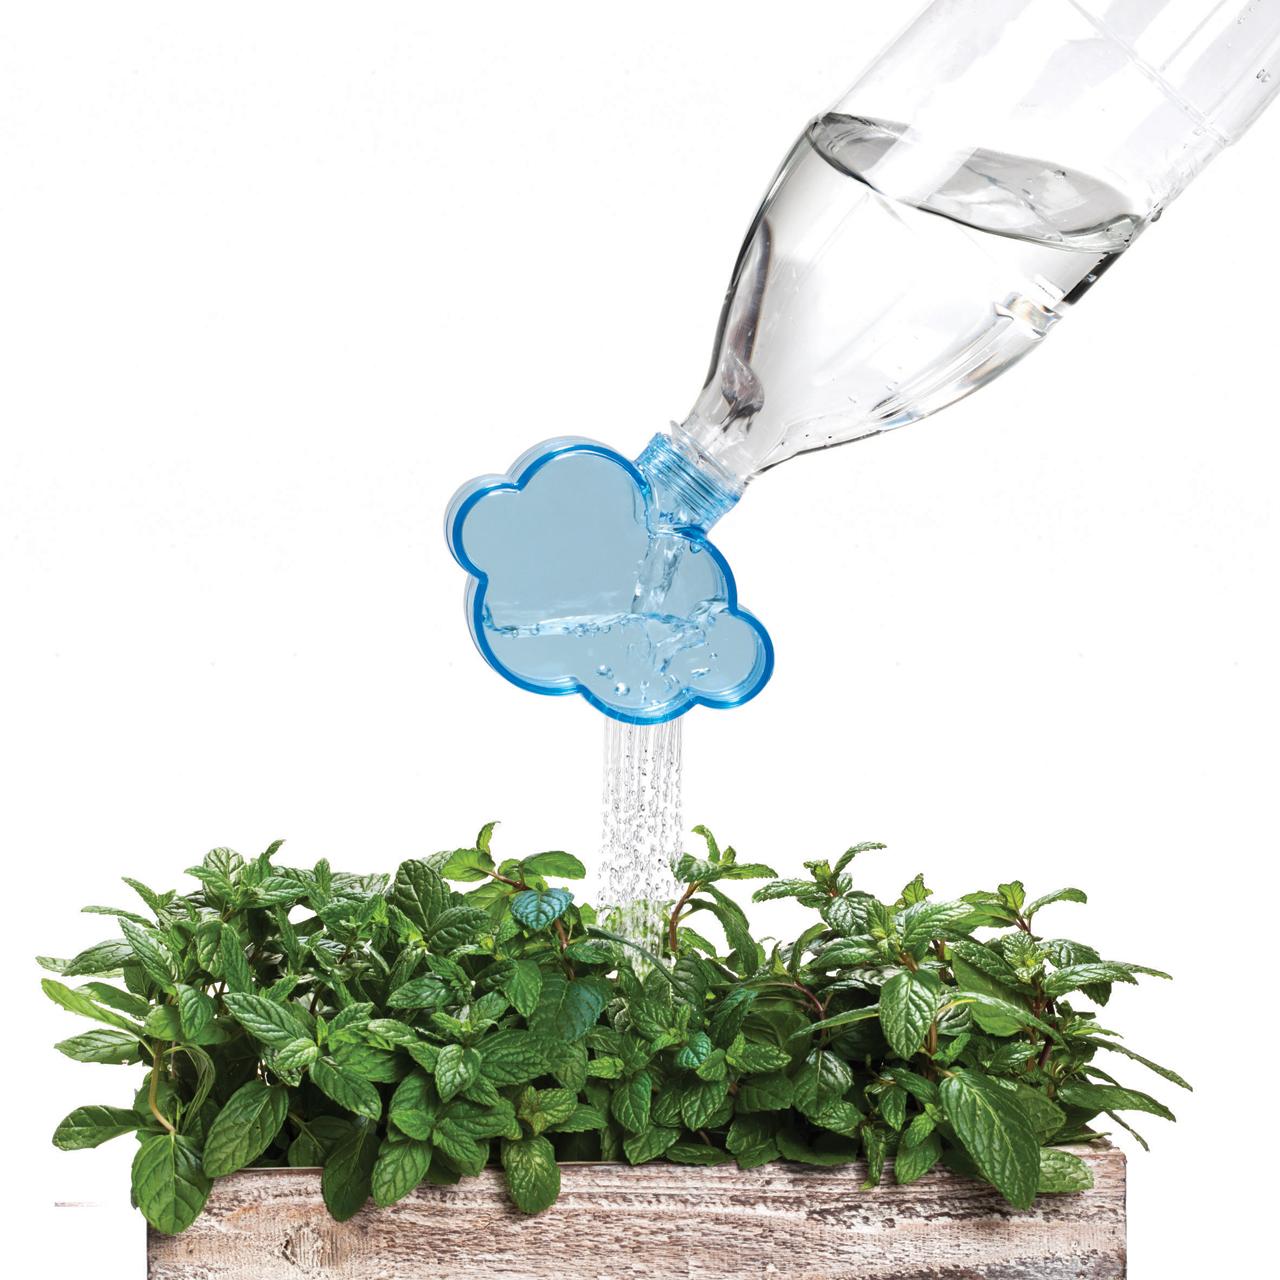 Rainmaker: A Plant Watering Cloud